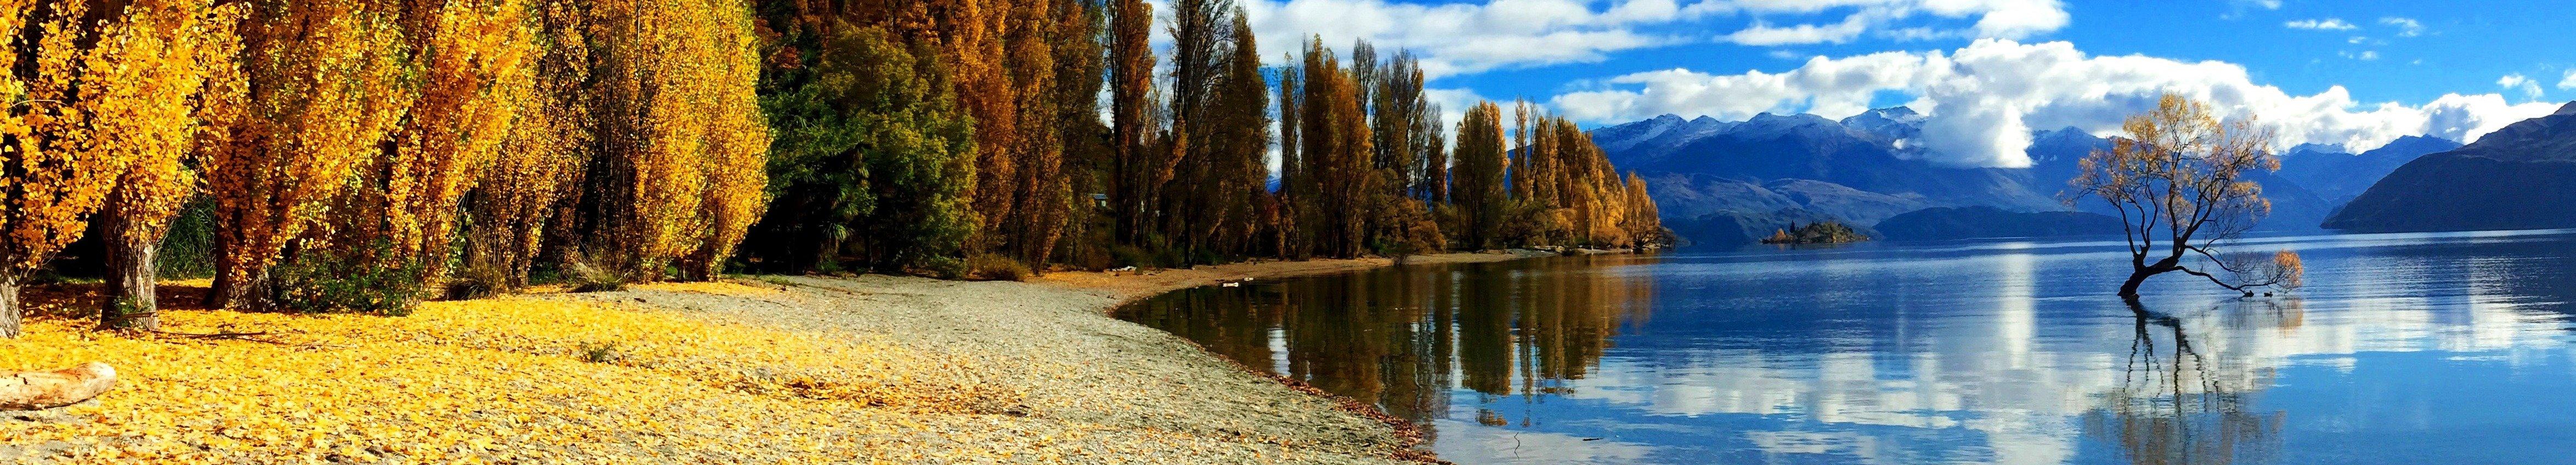 rsz-autumn-trees-colour-that-wanaka-tree-april-2015.jpg